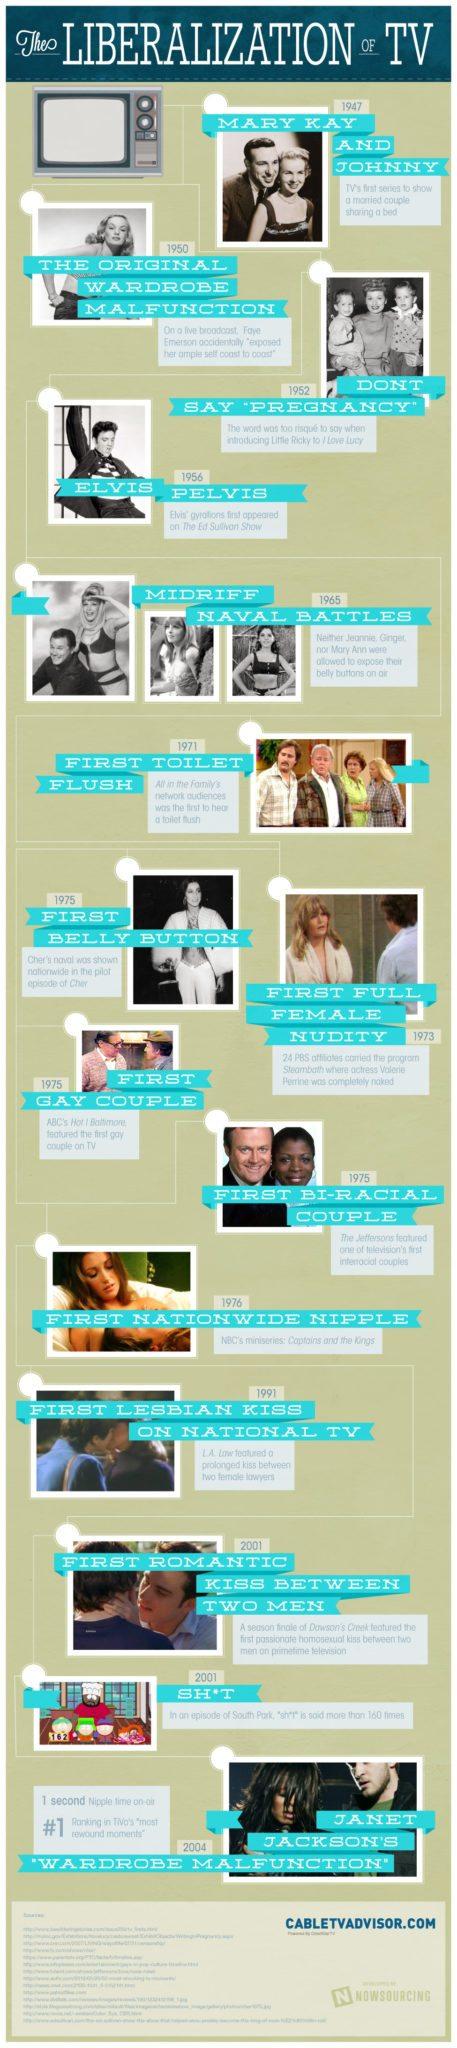 The Liberazliation of TV